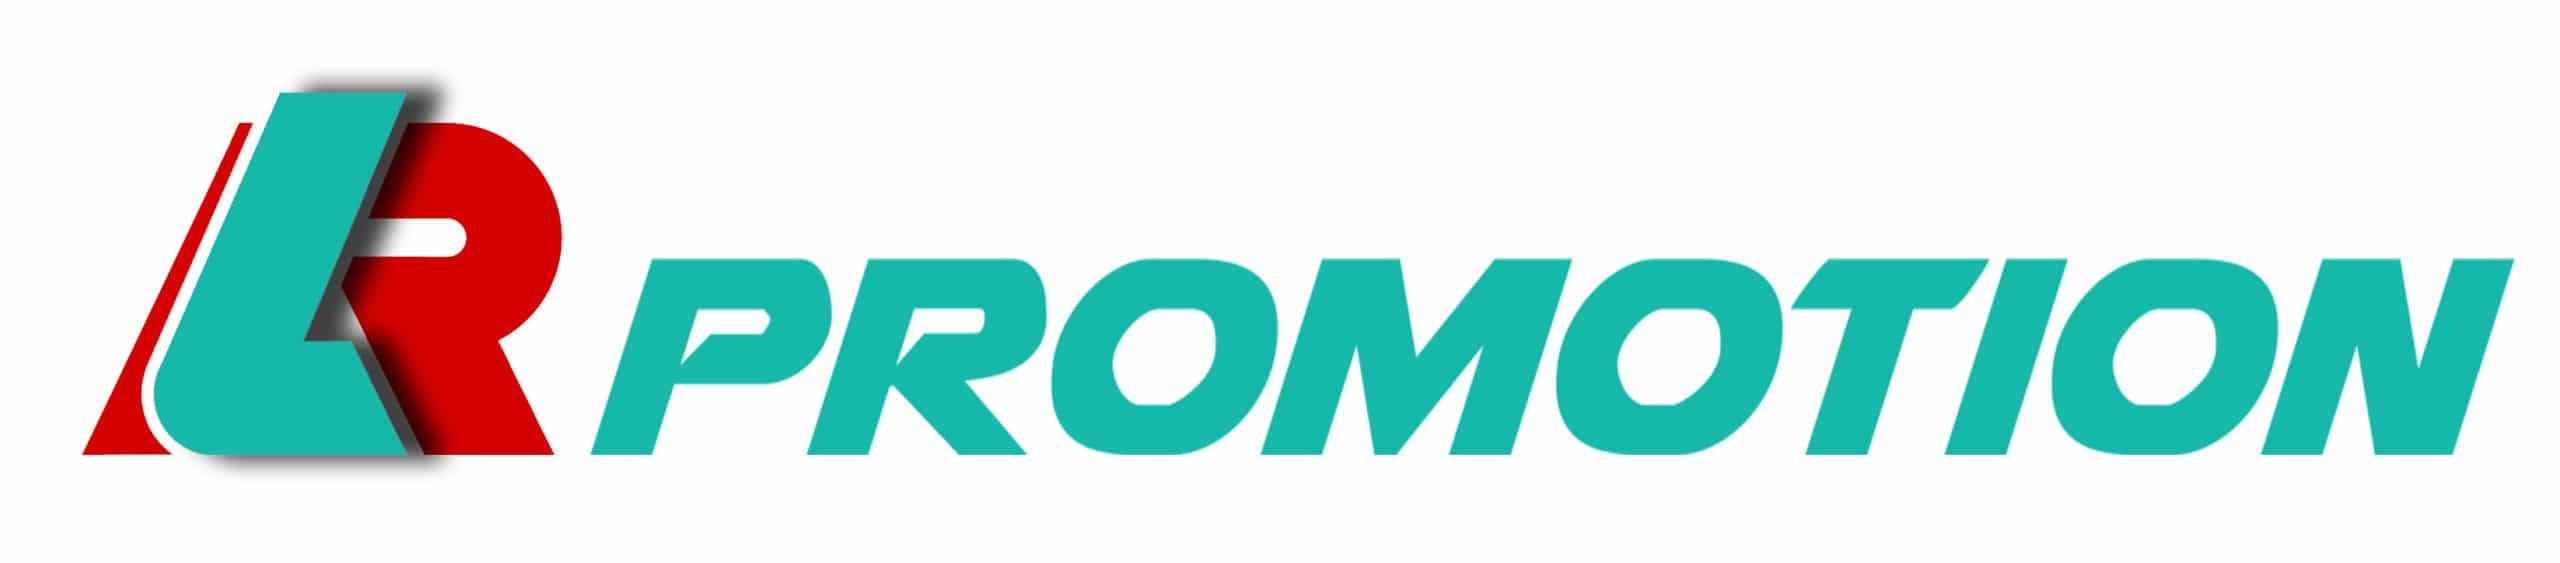 LR Promotion